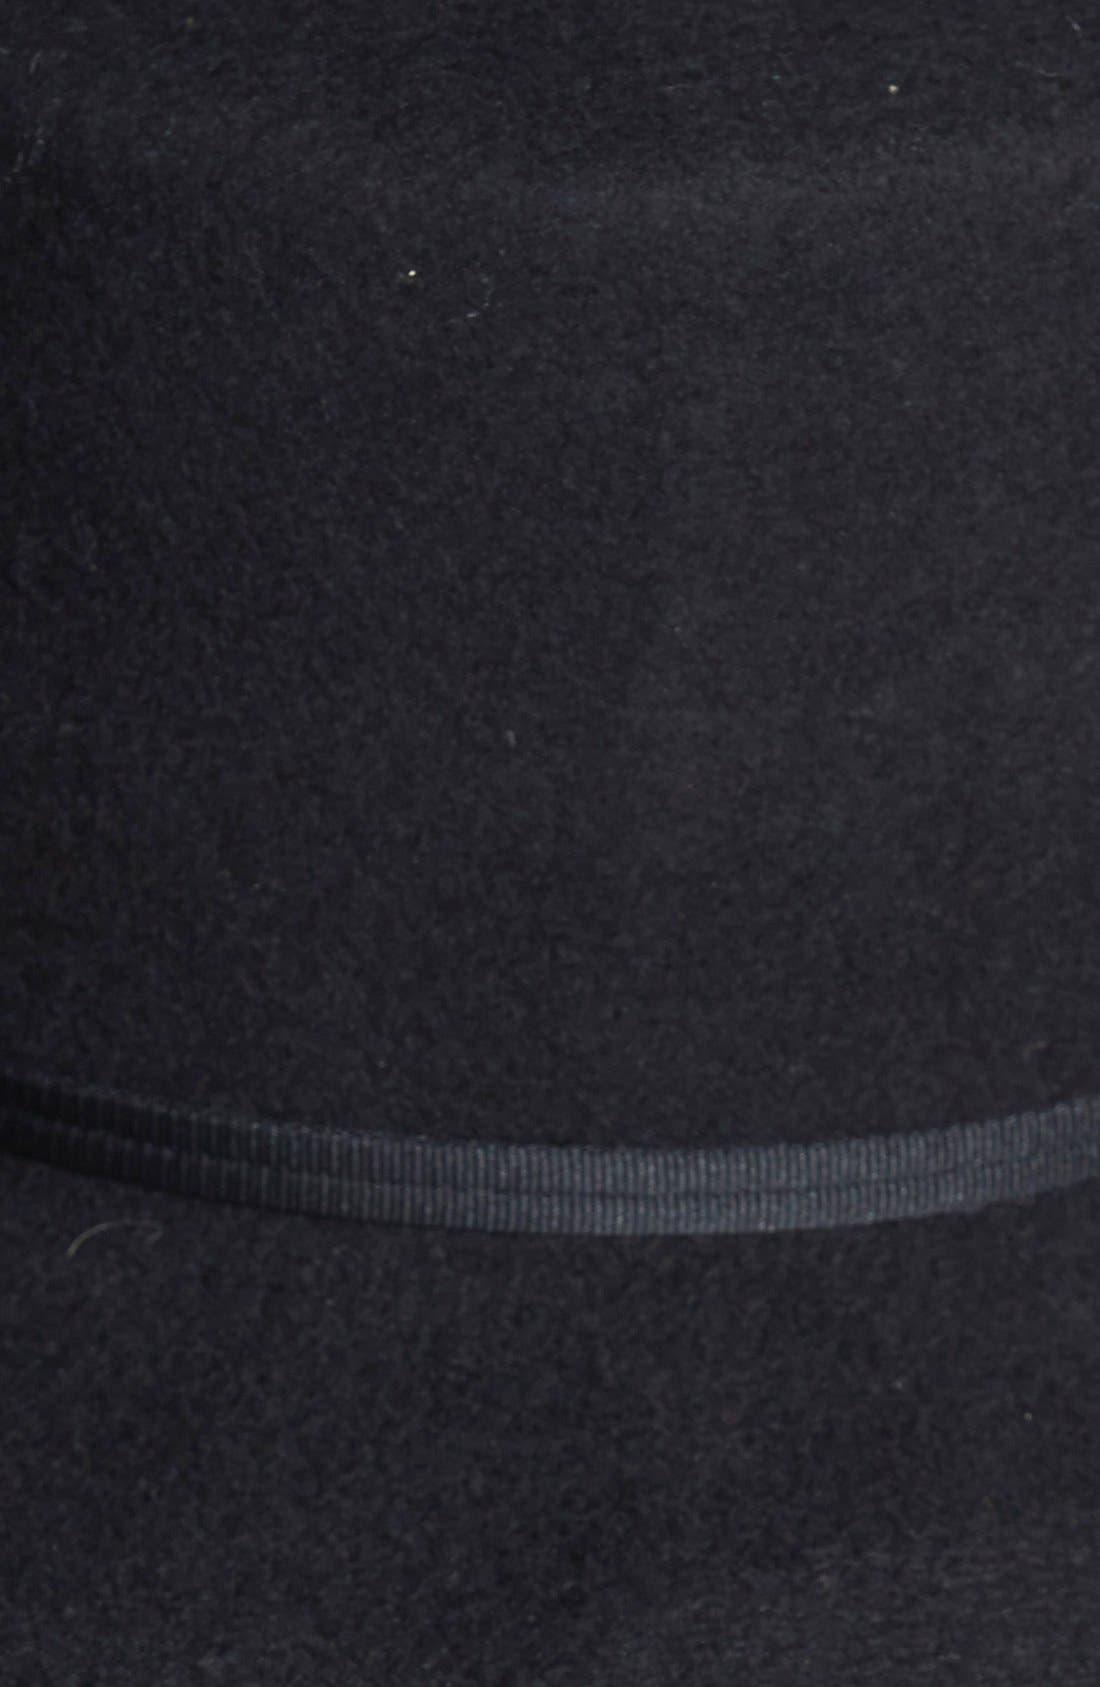 BRIXTON,                             'Buckley' Floppy Wool Hat,                             Alternate thumbnail 2, color,                             001